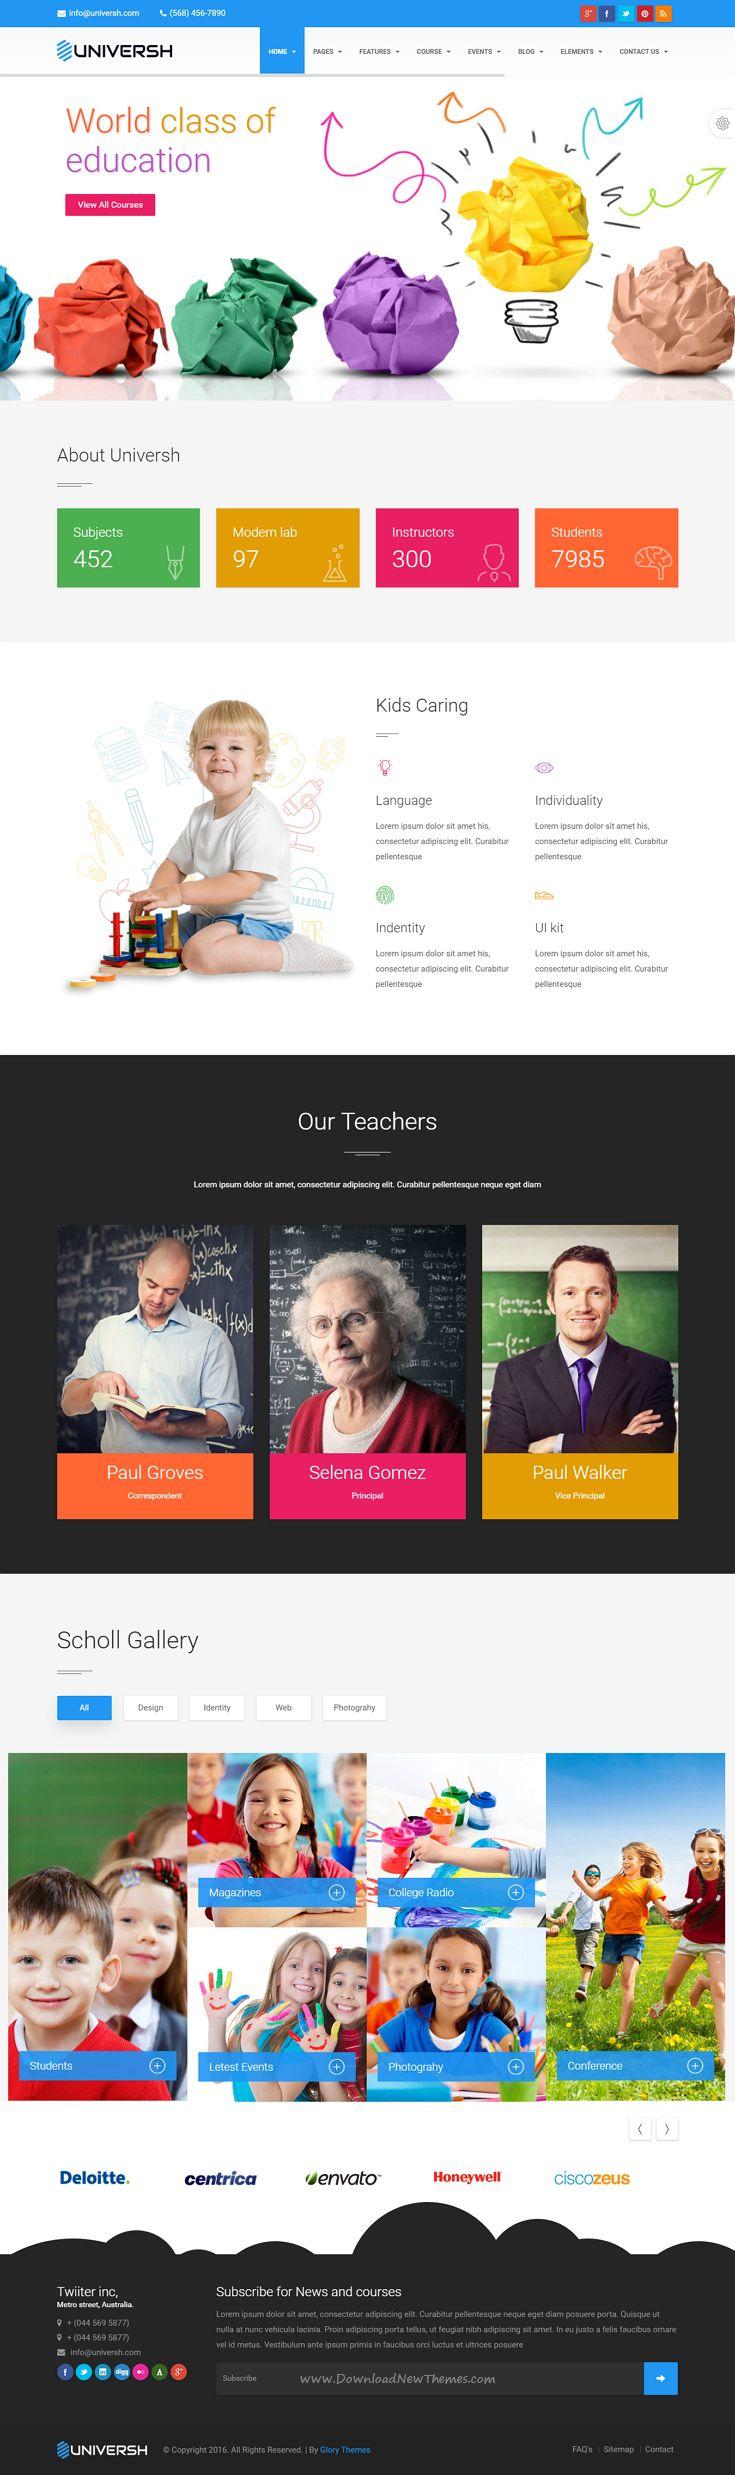 Universh - Material Education, Events, News, Learning Center & Kid School Multipurpose Bootstrap HTML Template #daycare #kindergarten #website